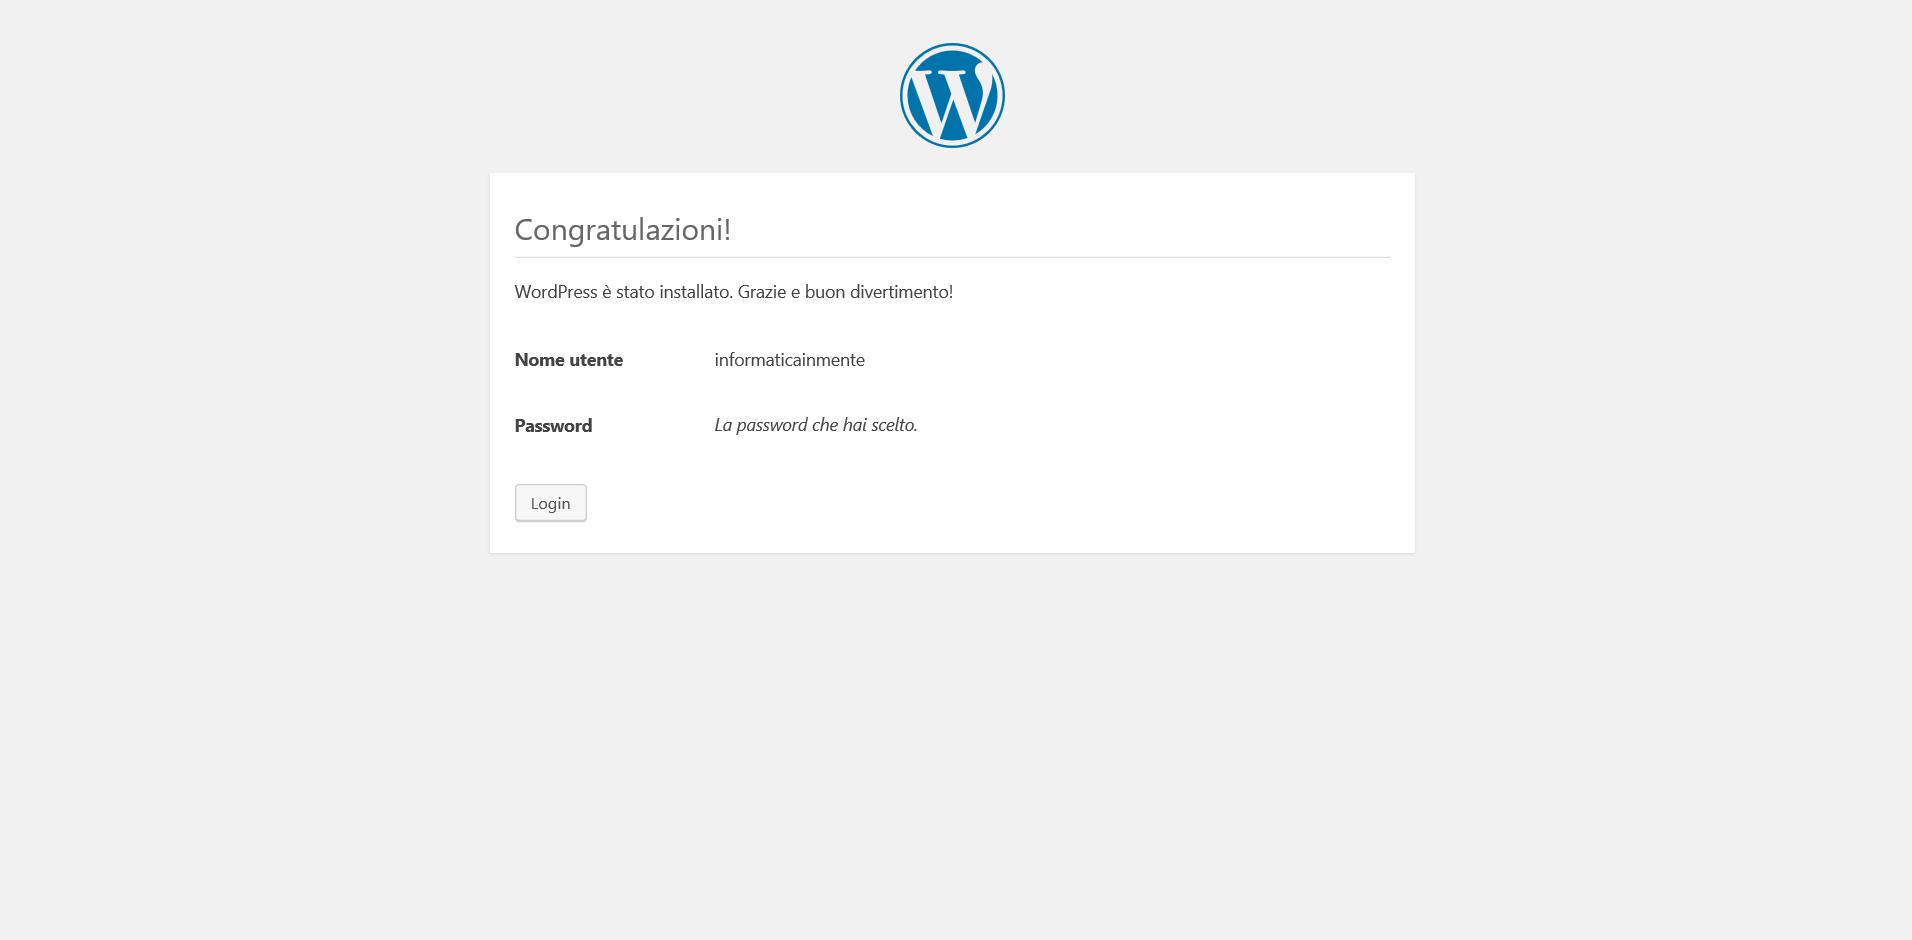 wordpress installato